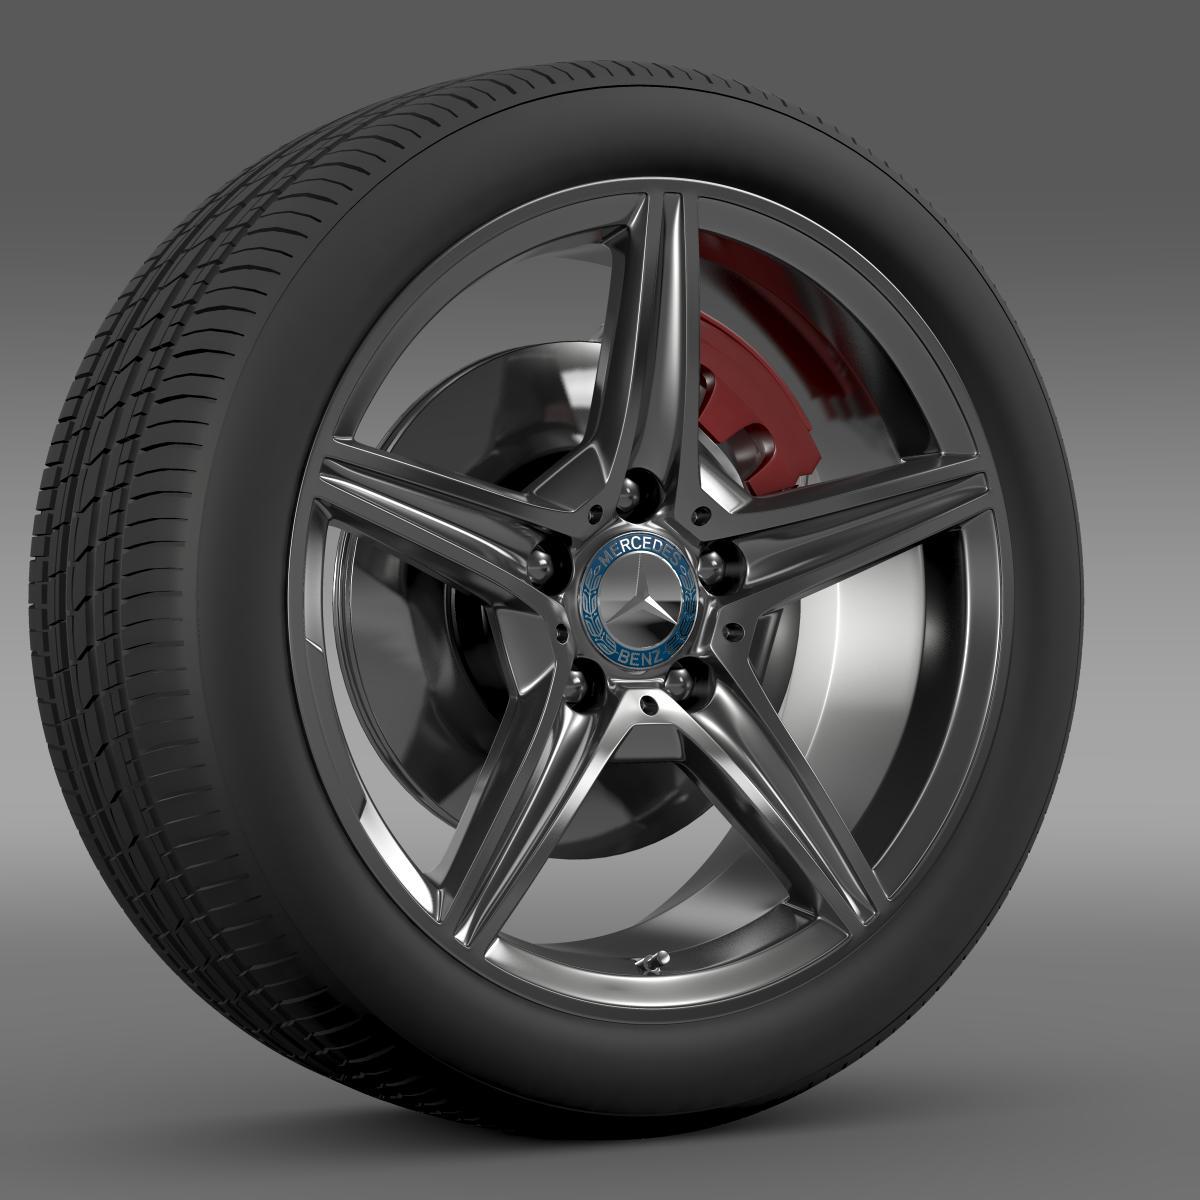 mercedes benz c 400 4matic amg line wheel 3d model 3ds max fbx c4d lwo ma mb hrc xsi obj 210786